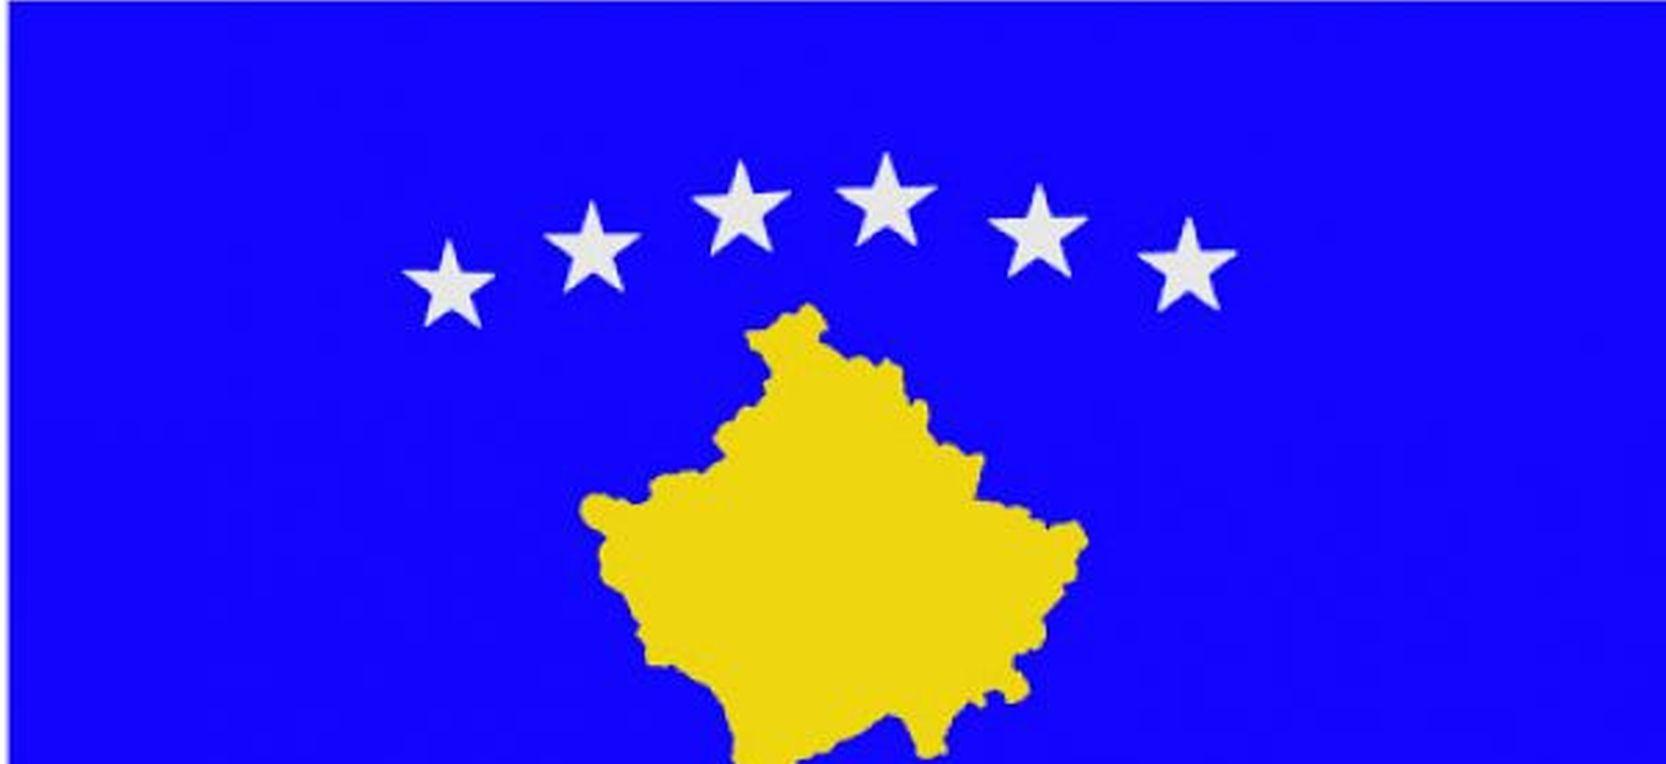 KOSOVO Otac izbo blizance stare samo dana, jedna beba preminula